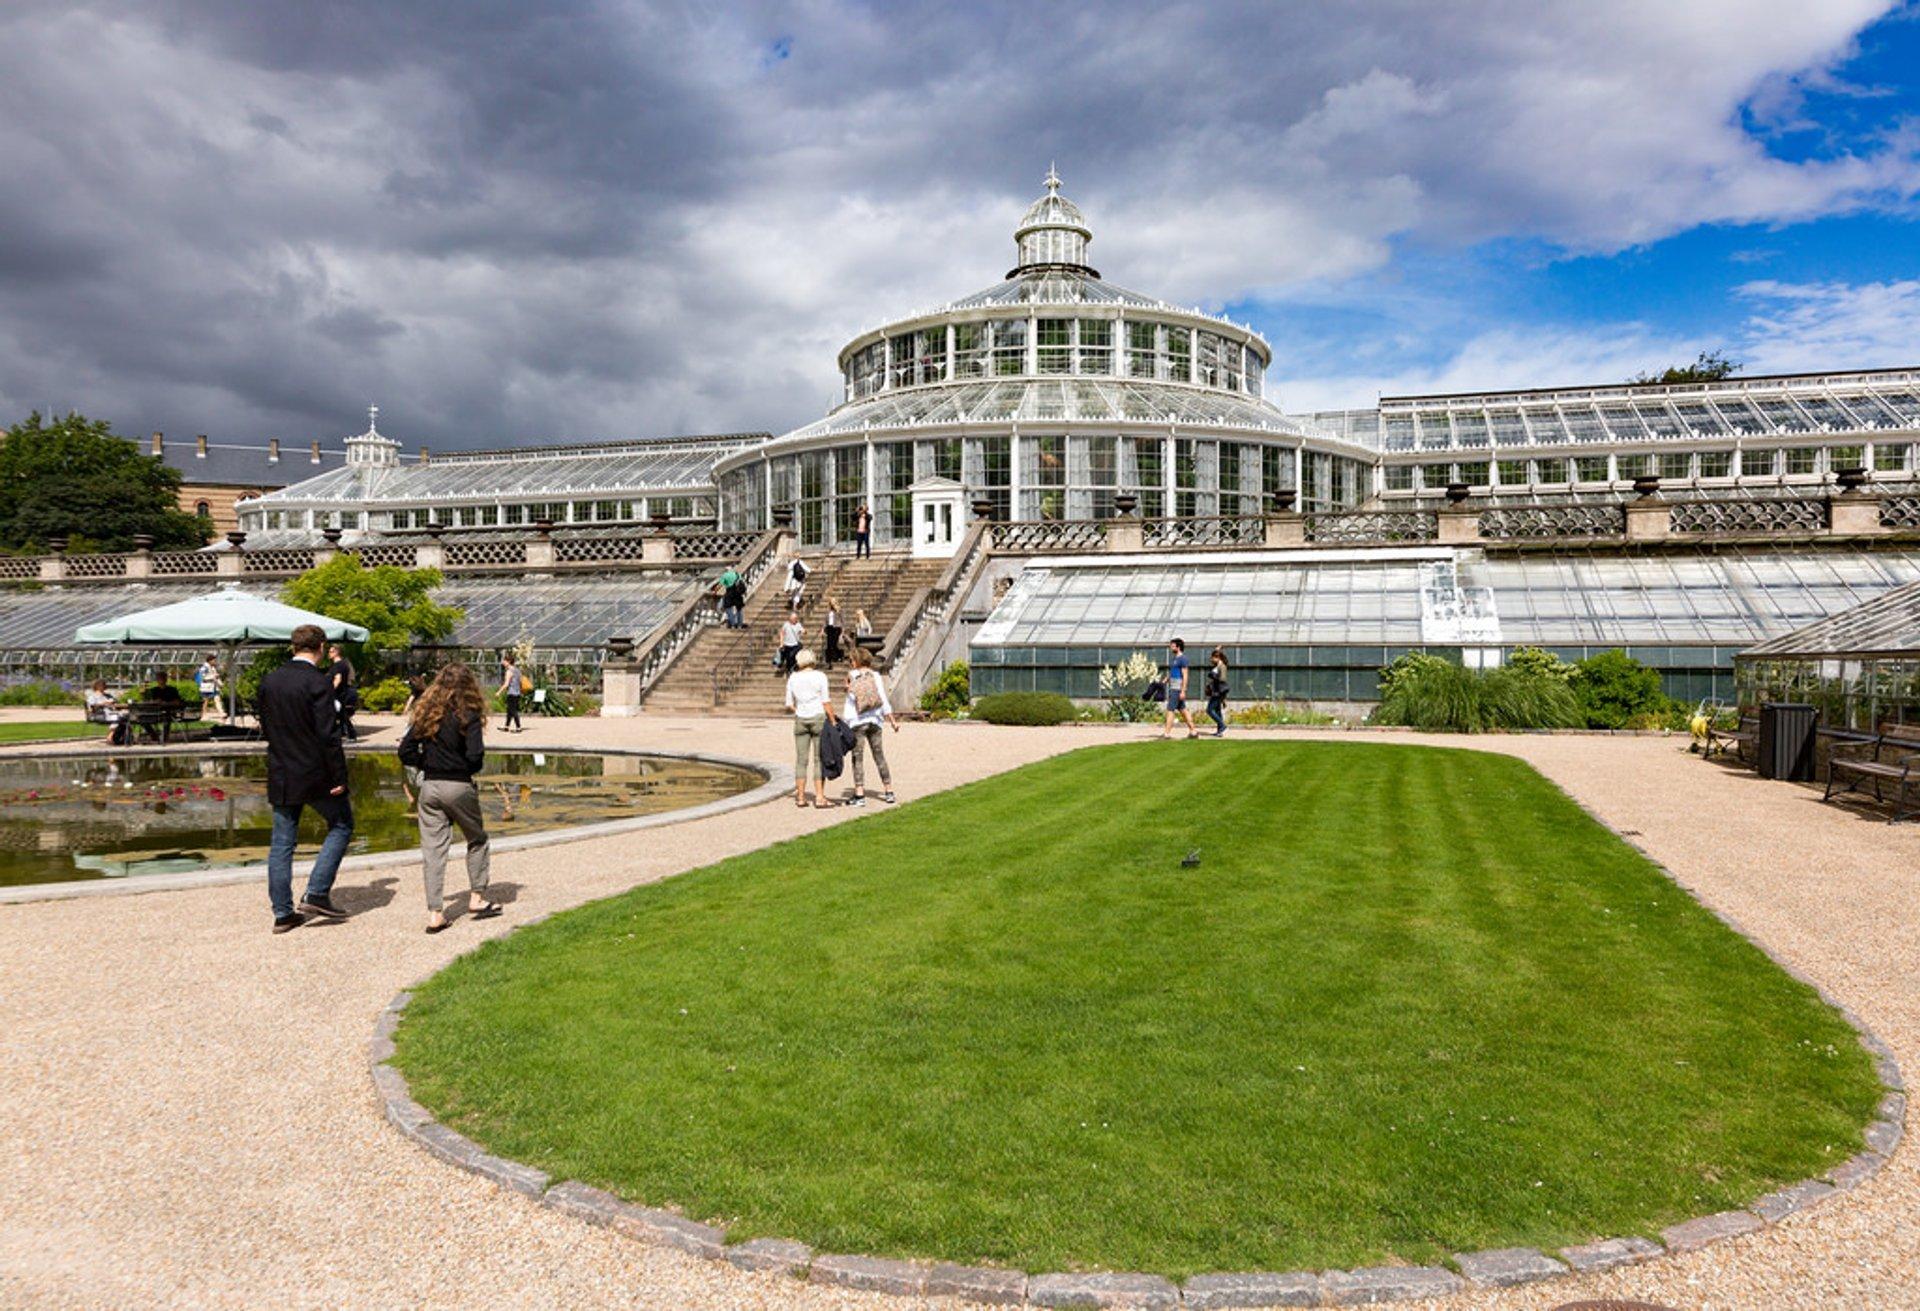 Botanisk Have (Botanical Garden) in Copenhagen 2020 - Best Time